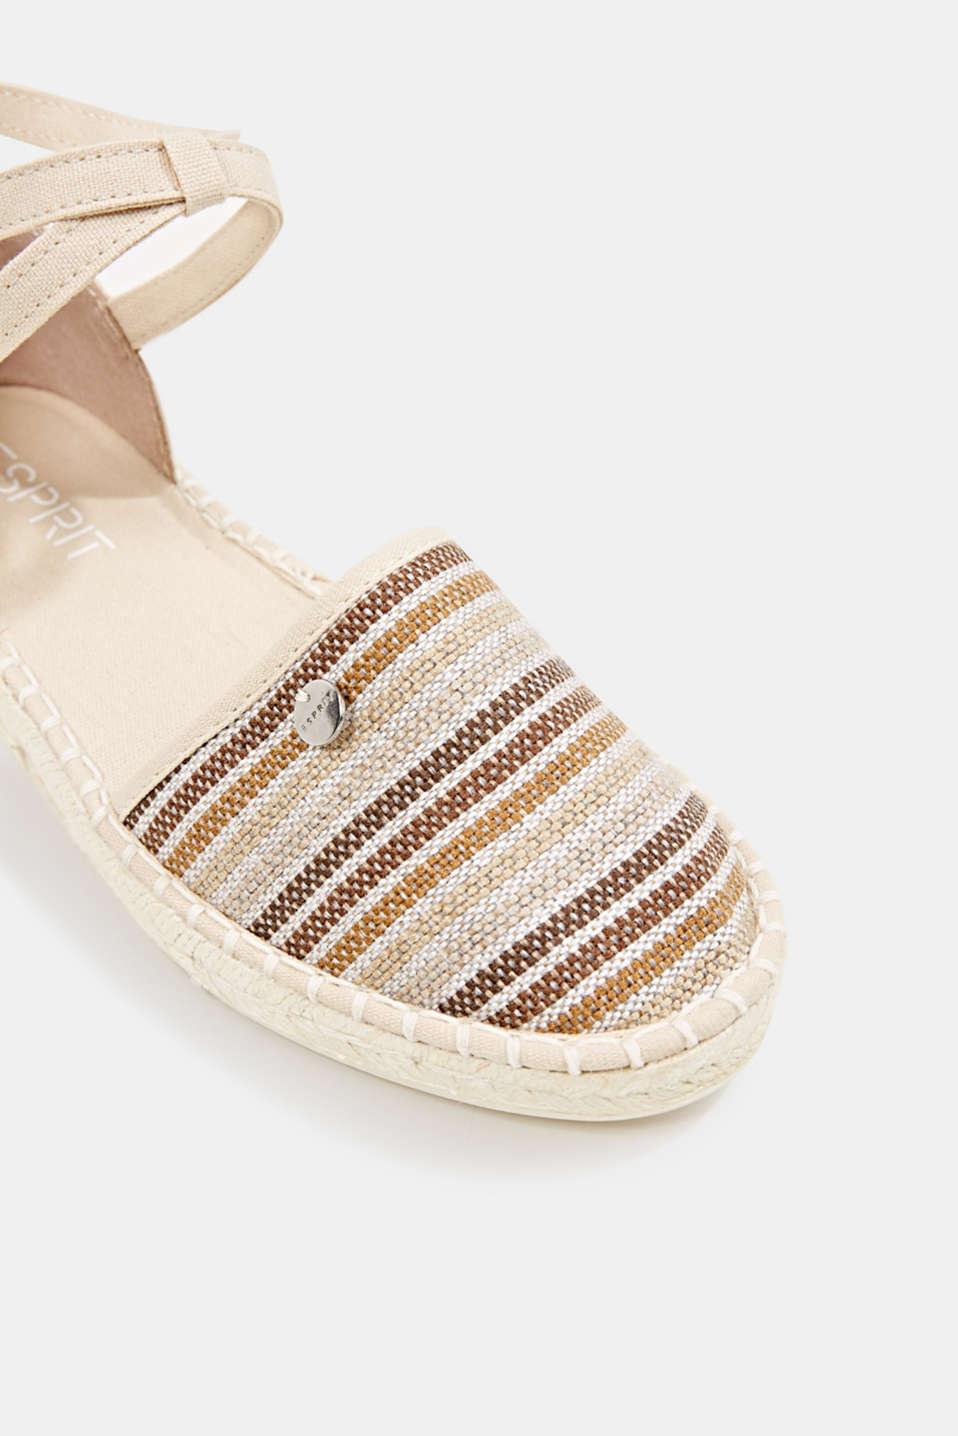 Espadrille sandals with stripes, CREAM BEIGE, detail image number 4